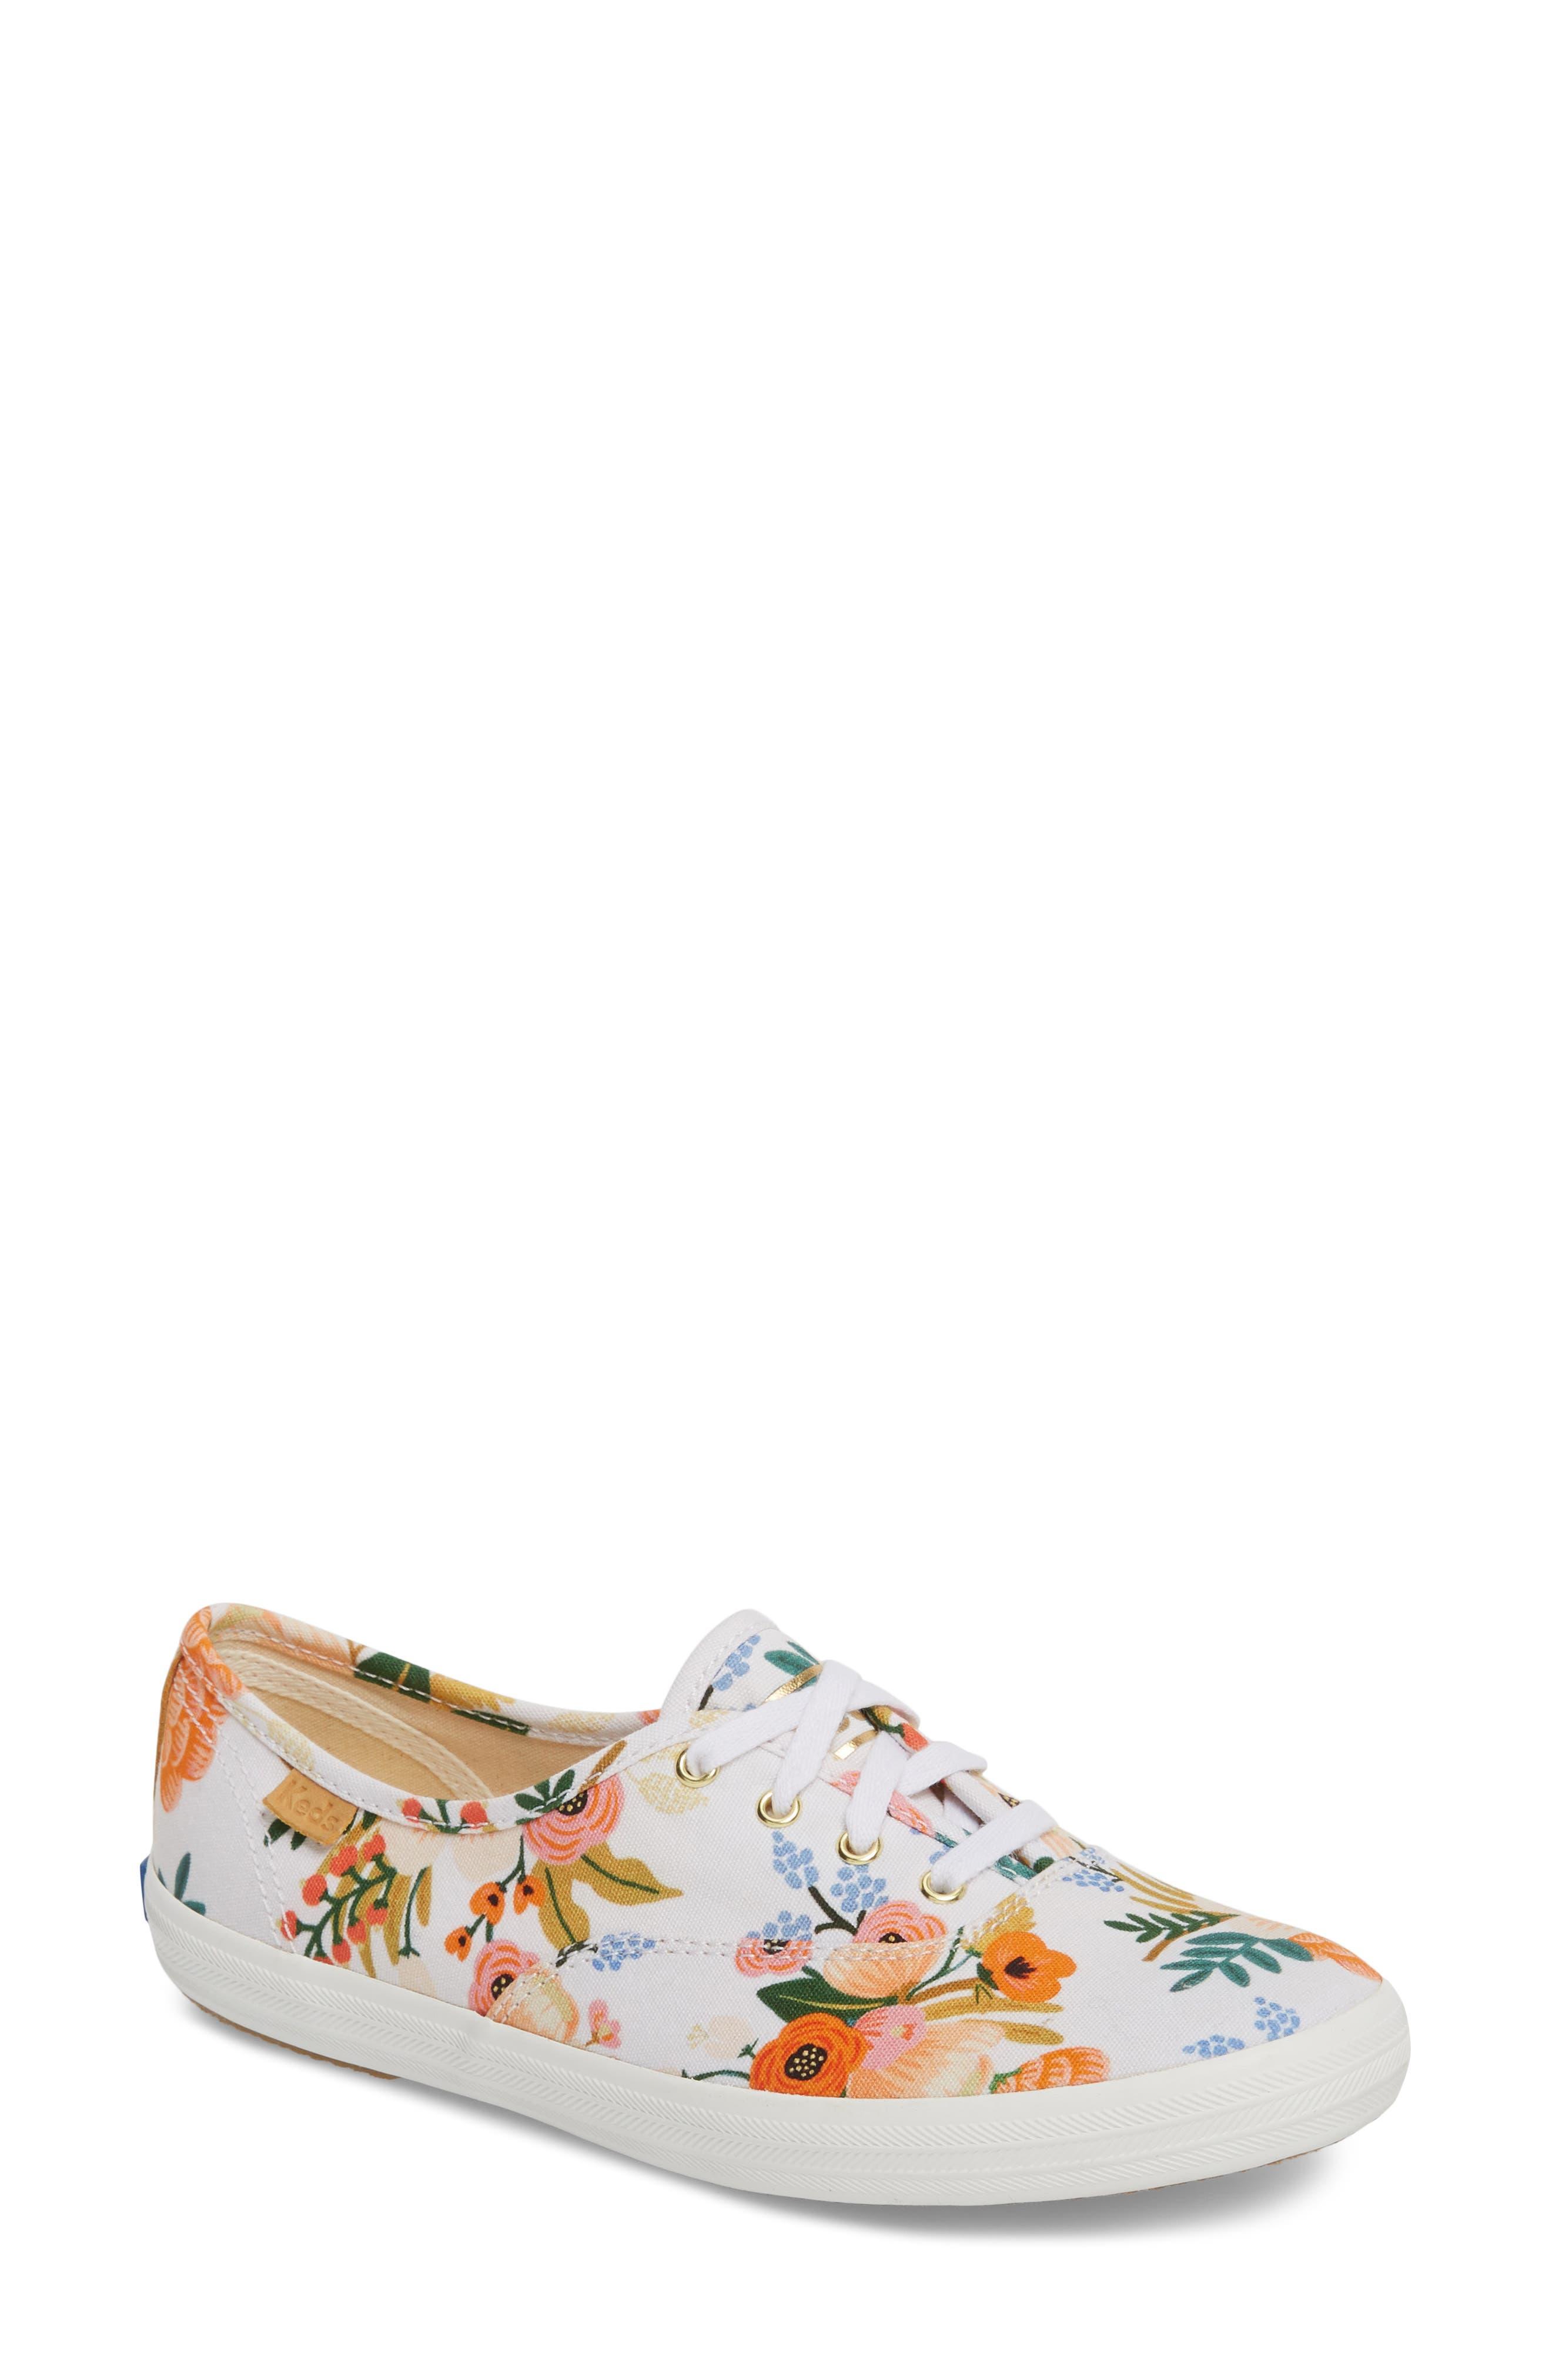 x Rifle Paper Co. Champion Floral Print Sneaker,                             Main thumbnail 1, color,                             WHITE